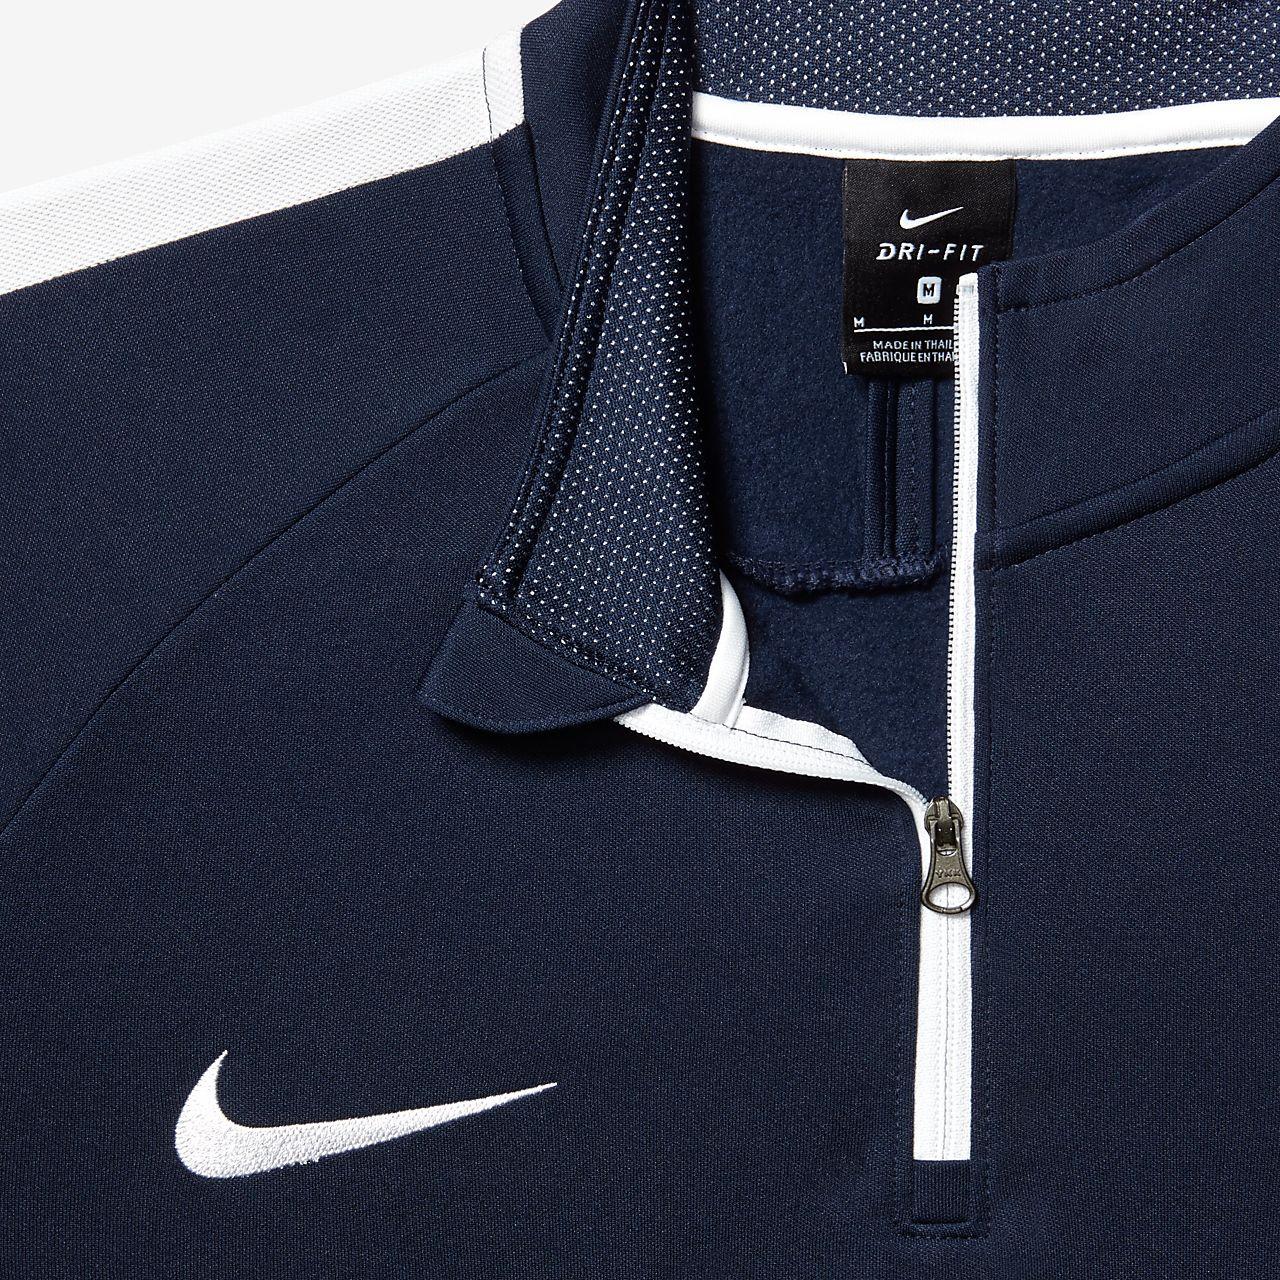 70947d9942a Nike Dri-FIT Academy Voetbaltop met korte rits voor heren. Nike.com BE